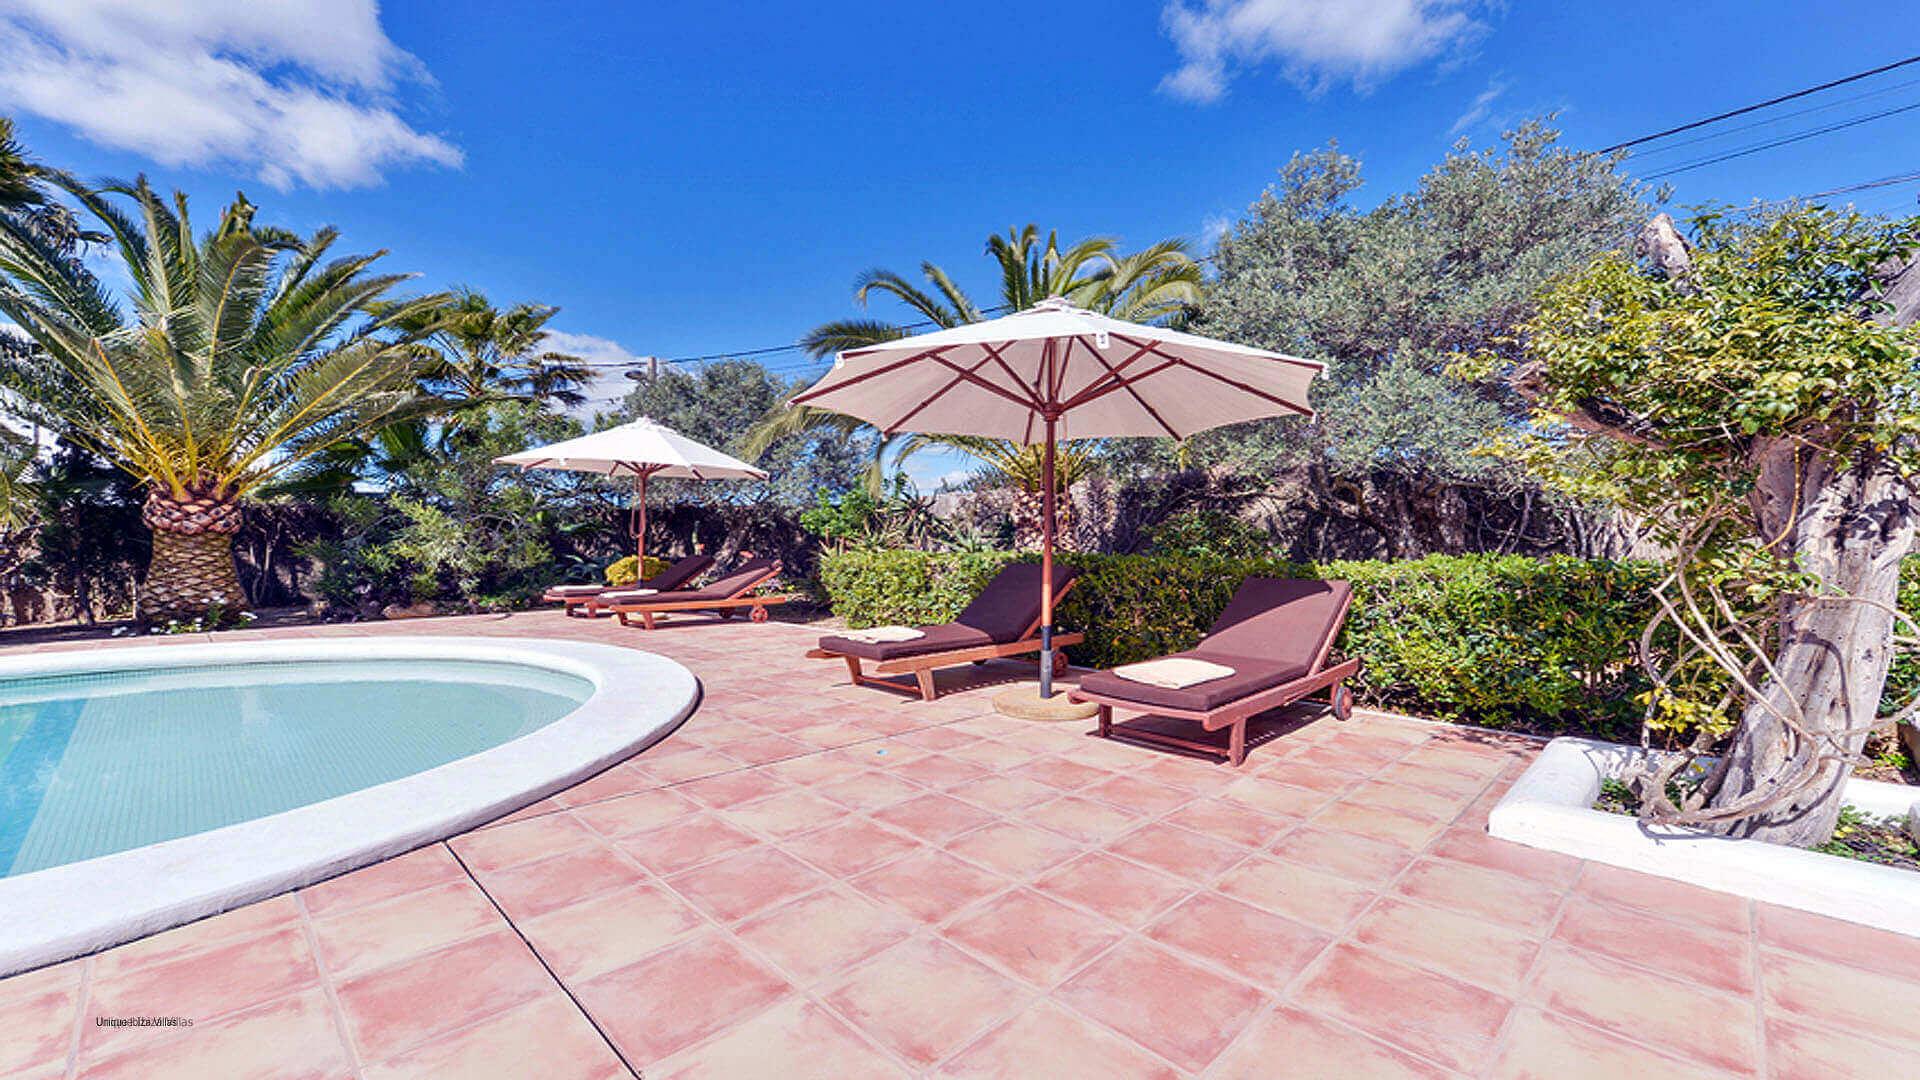 Villa Jaume Dalt Ibiza 4 Playa Den Bossa